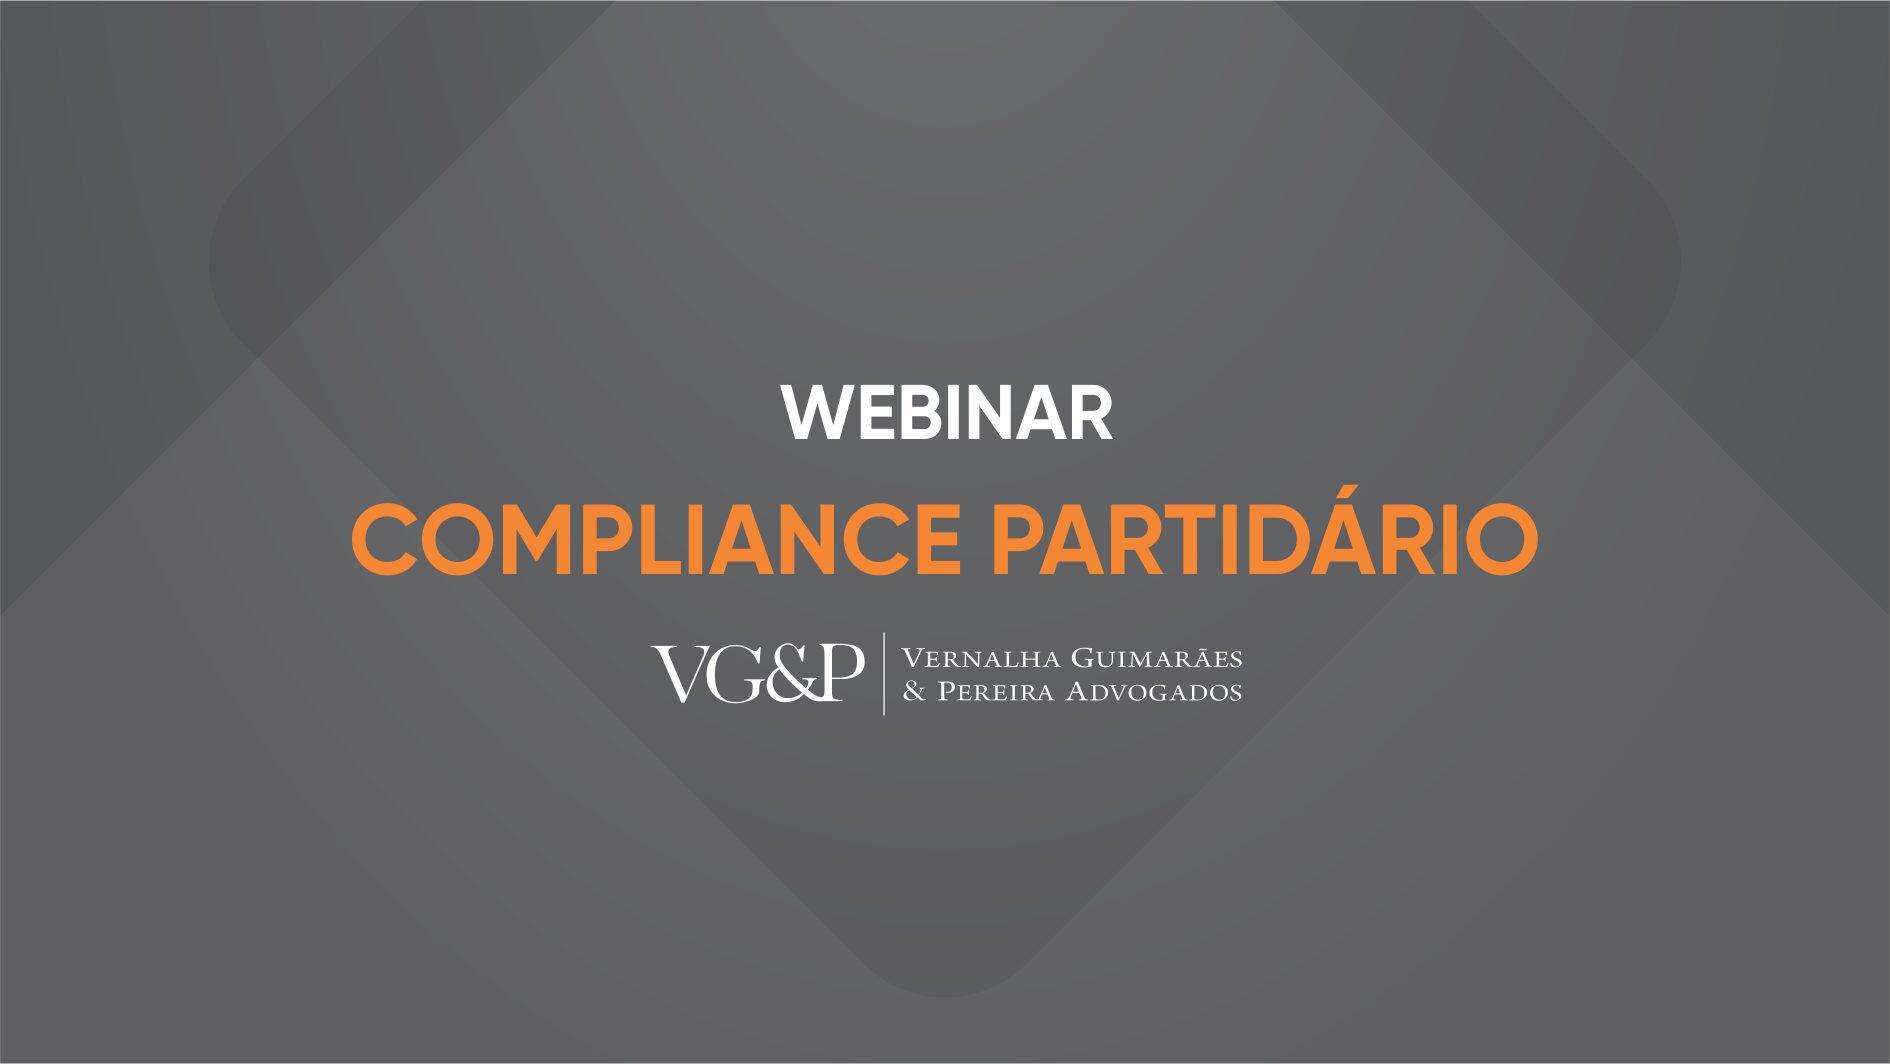 VGP Advogados realiza webinar sobre compliance partidário